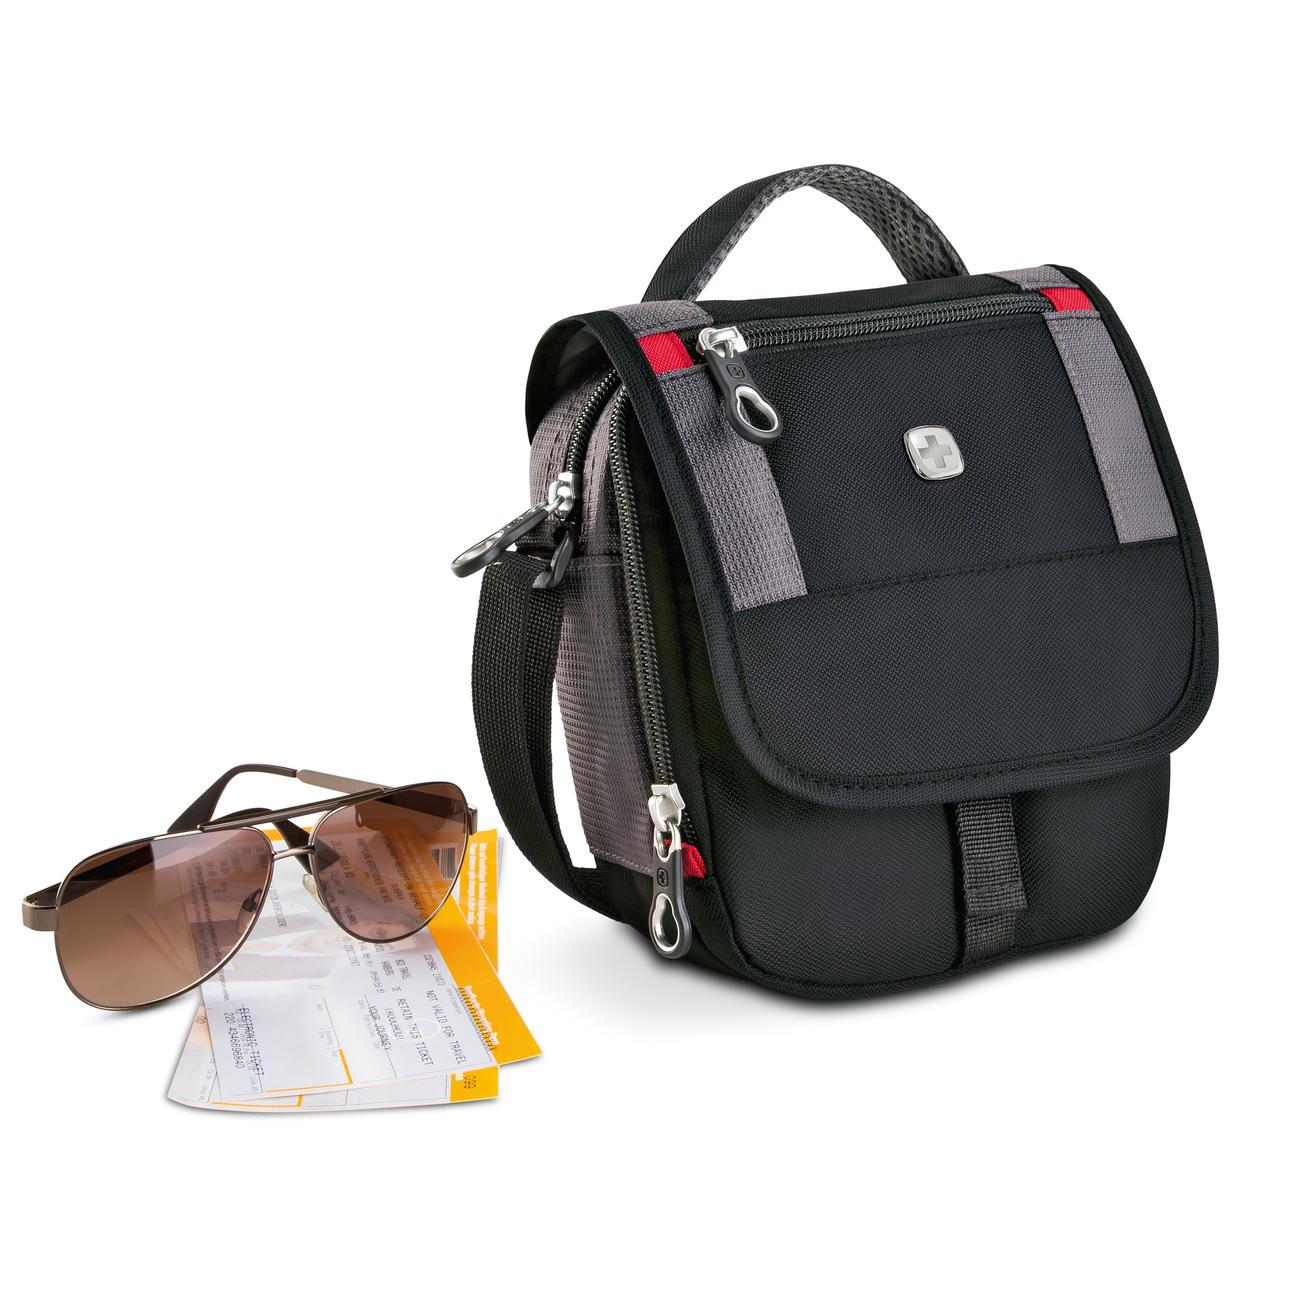 buy wenger mini boarding bag 3 year product guarantee